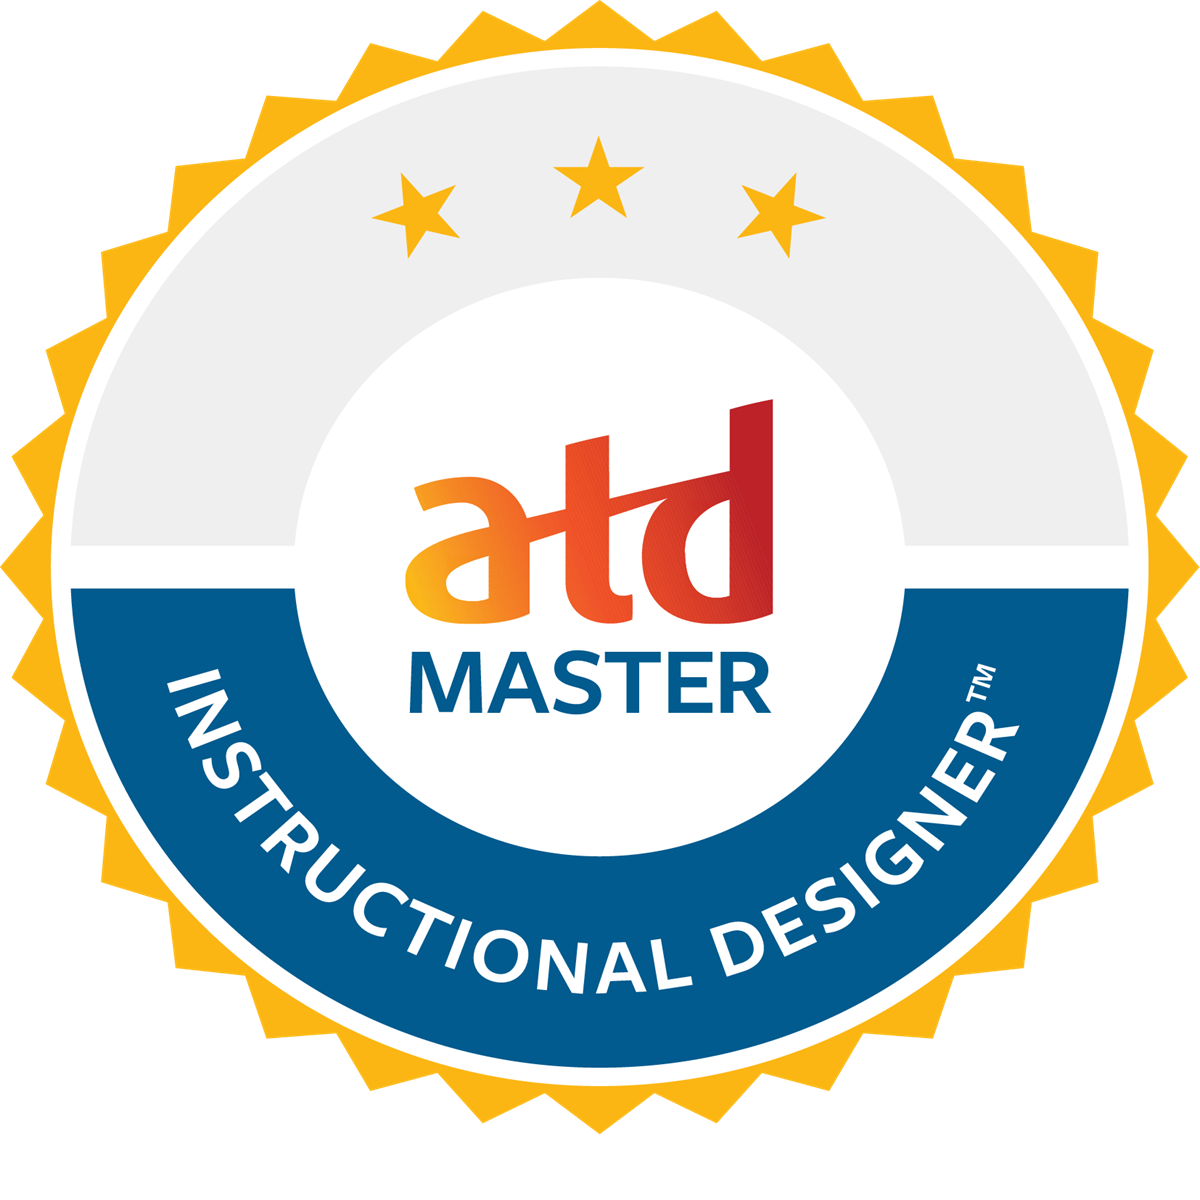 Association for Talent Development (ATD) Master Instructional Designer™